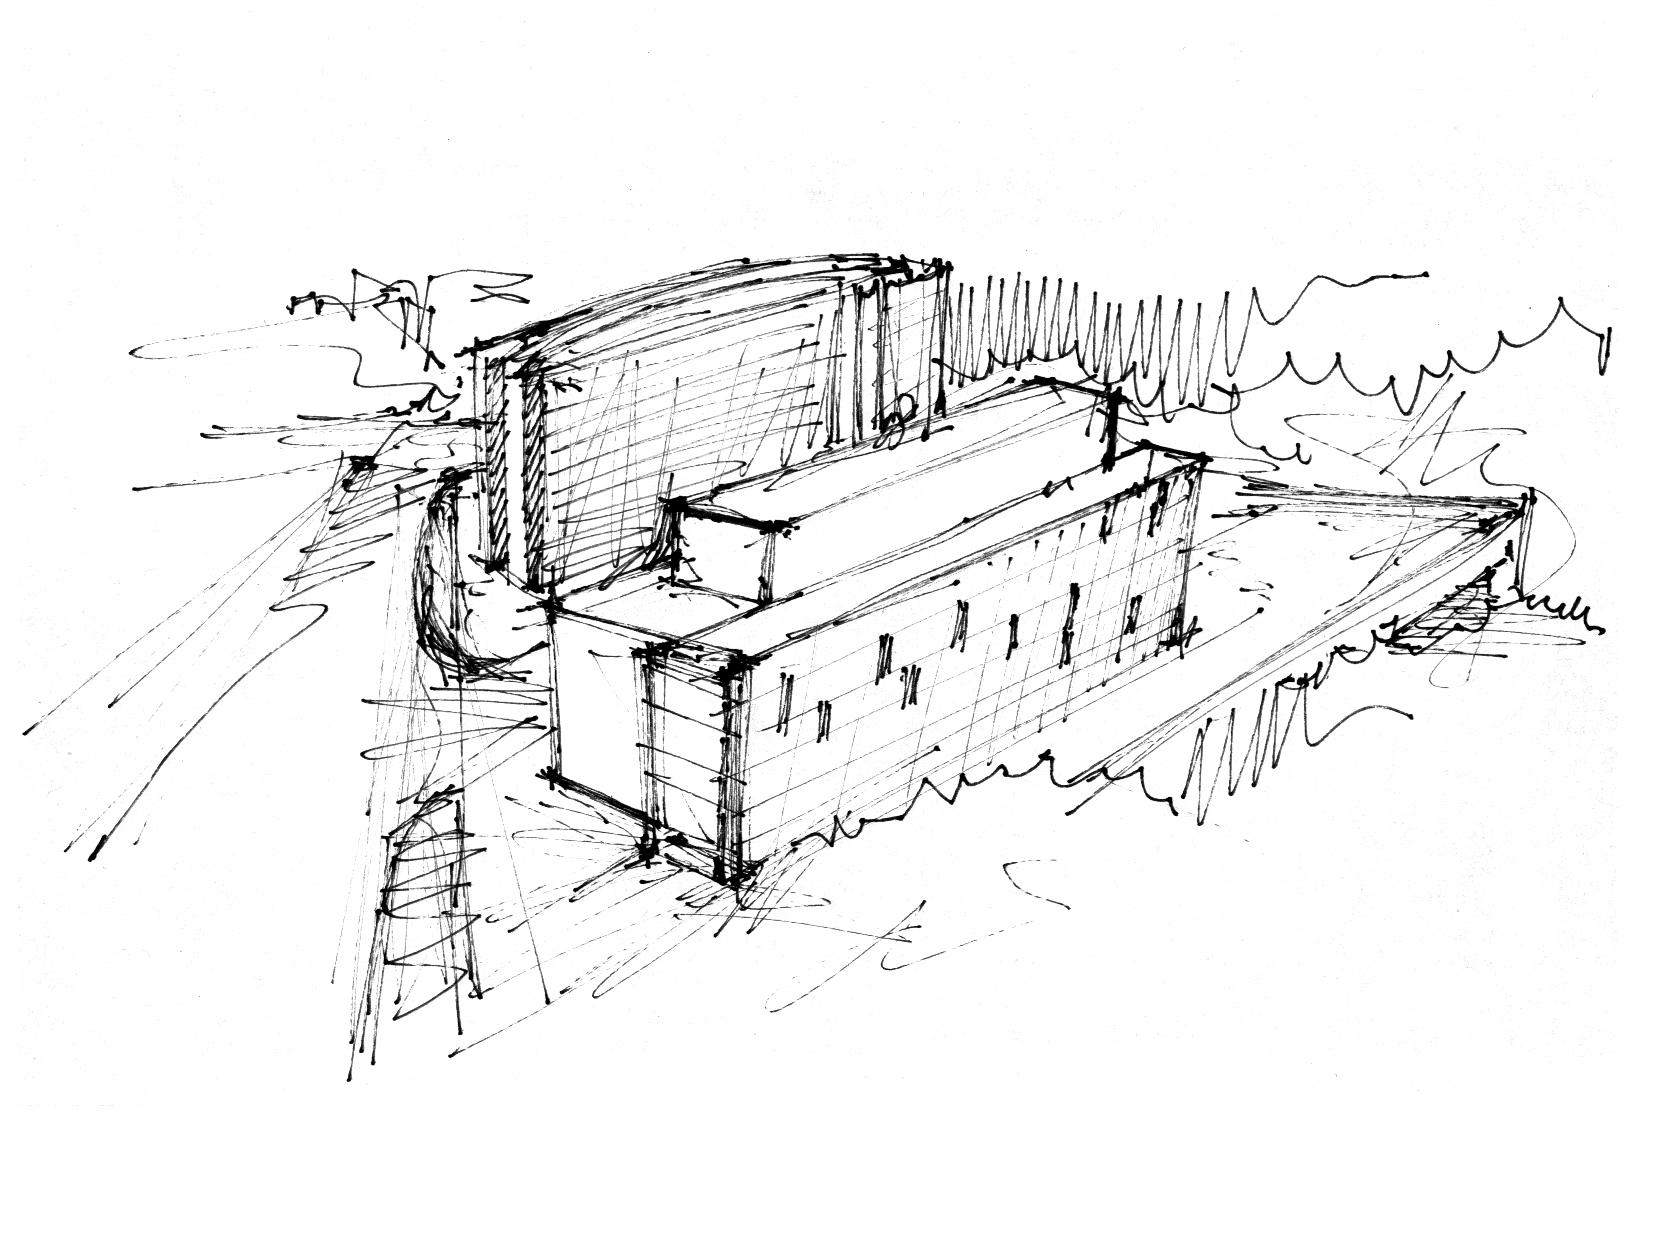 sb_sketch-2.jpg